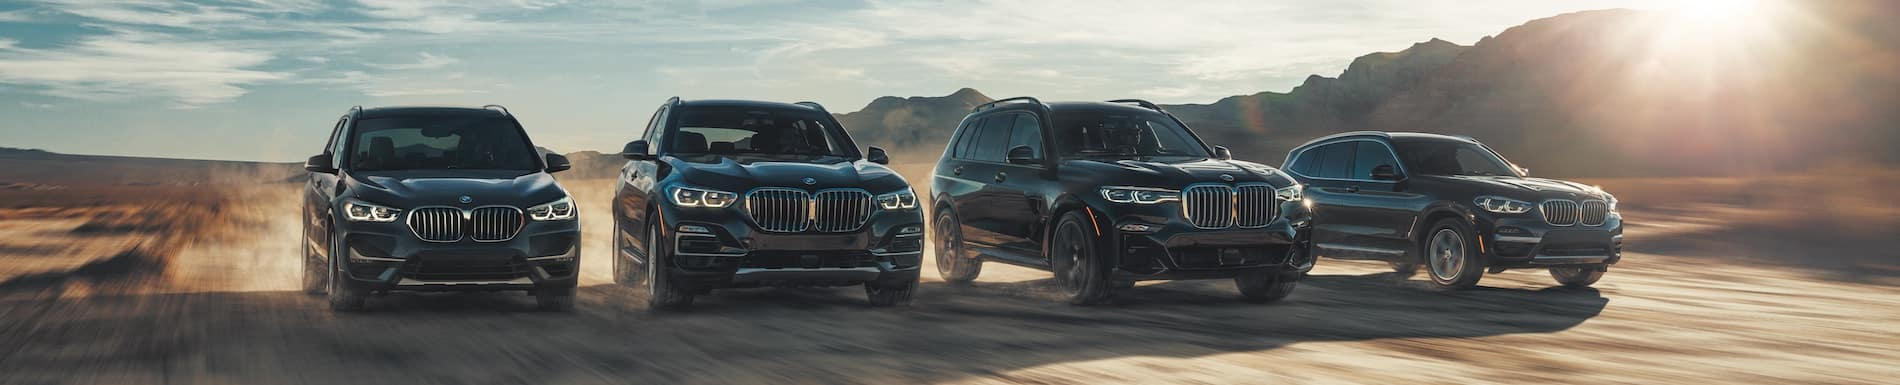 BMW Vehicle Line Up